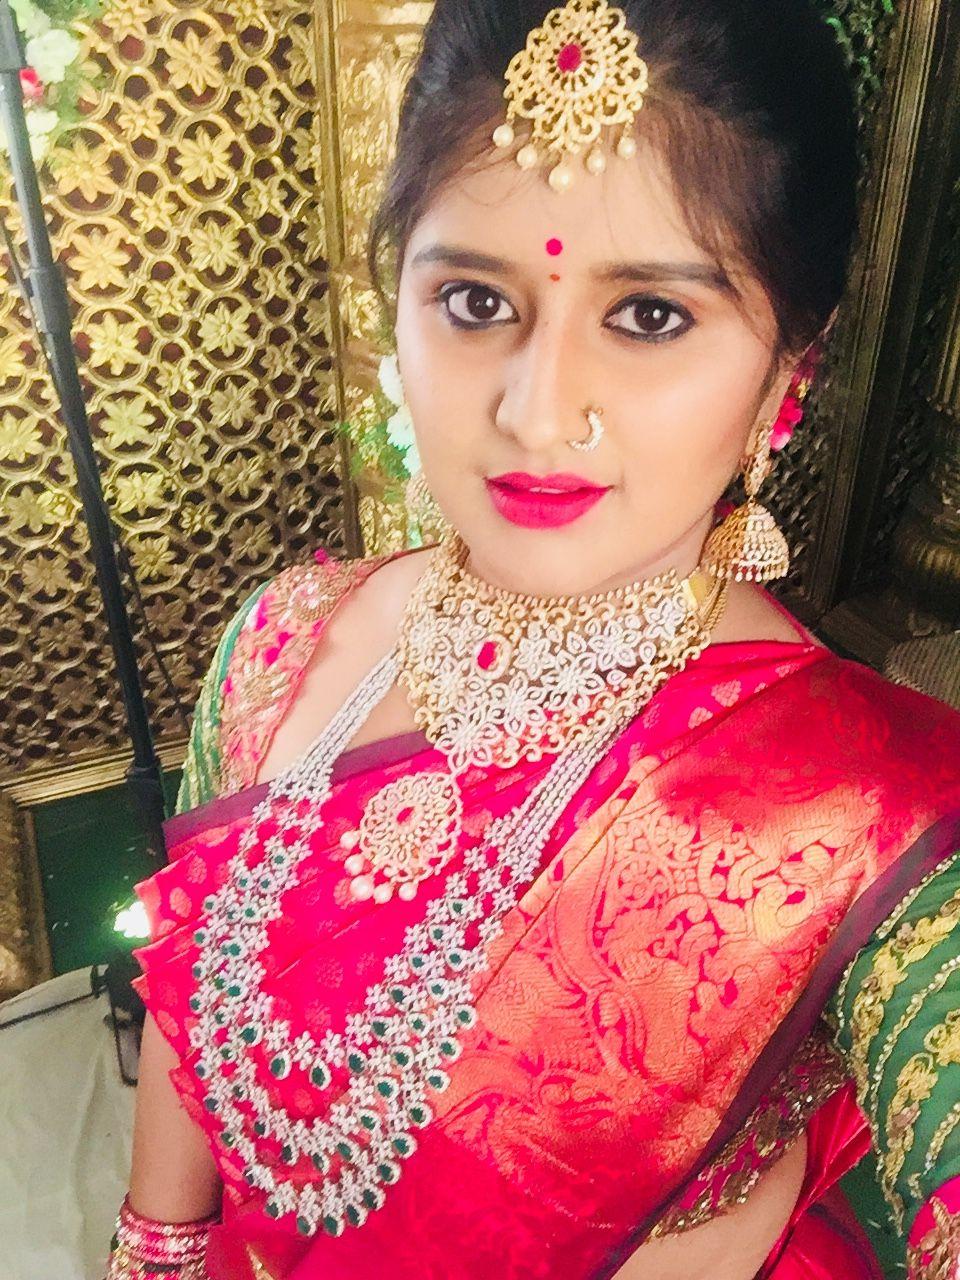 Saree jewellery images bride in bright pink saree n heavy diamond jewellery  jewllery